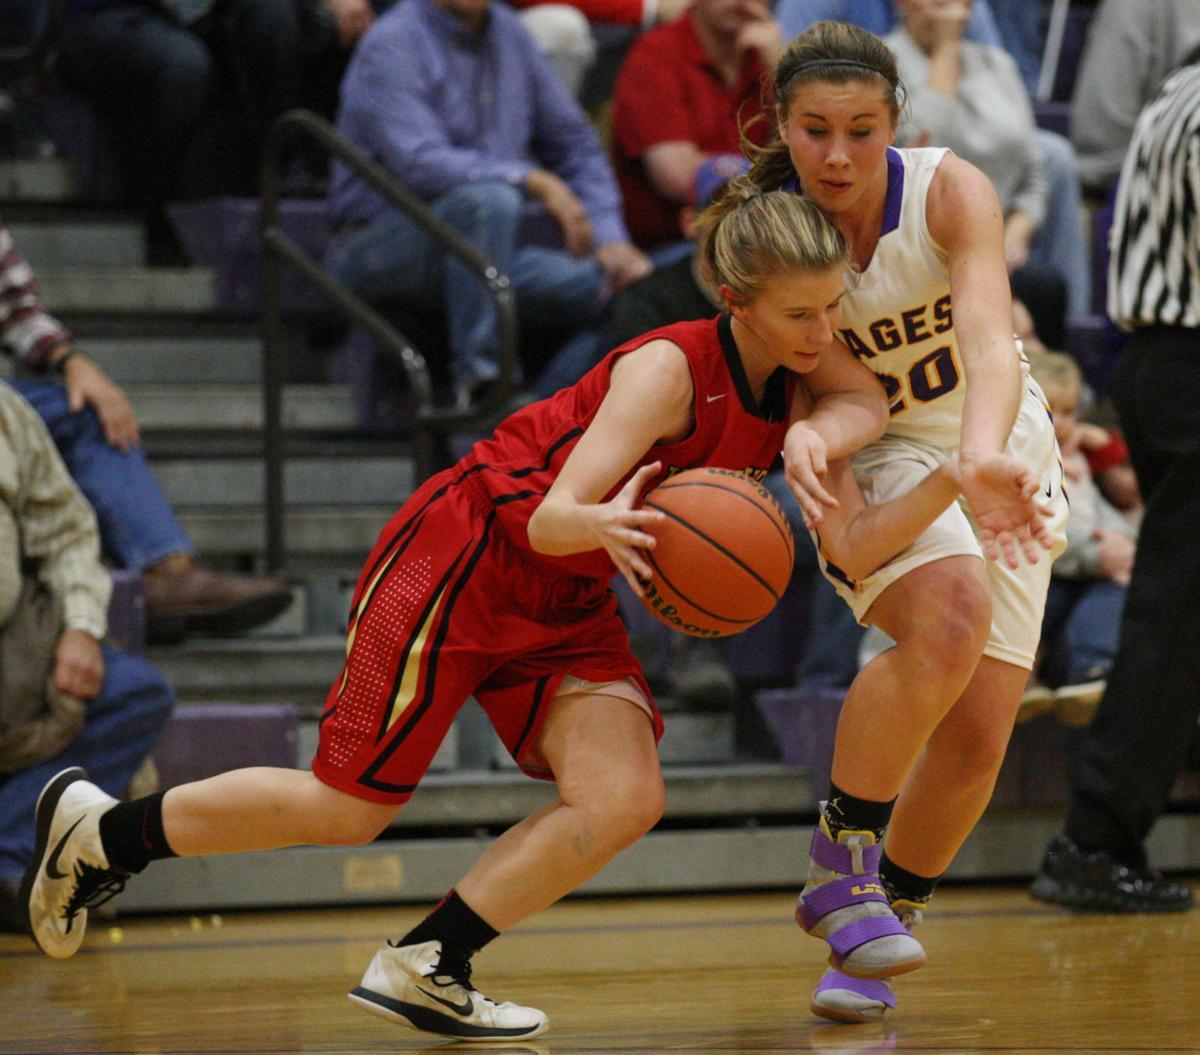 Monticello vs A-L-A-H girls basketball 3 11.18.16.jpg